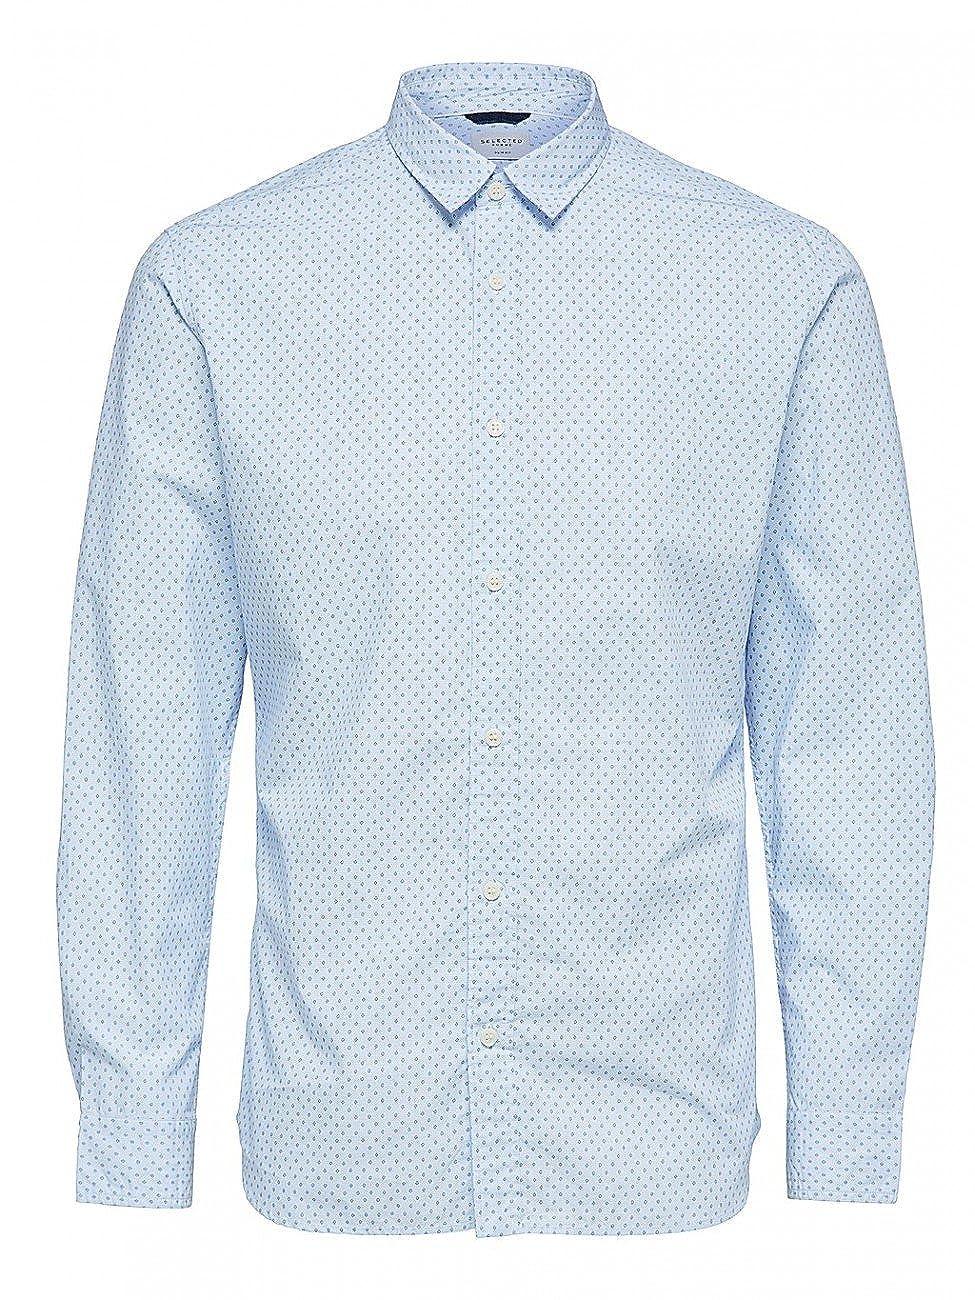 SELECTED HOMME Shhonemoonie Shirt LS Noos, Camicia Uomo 16060040